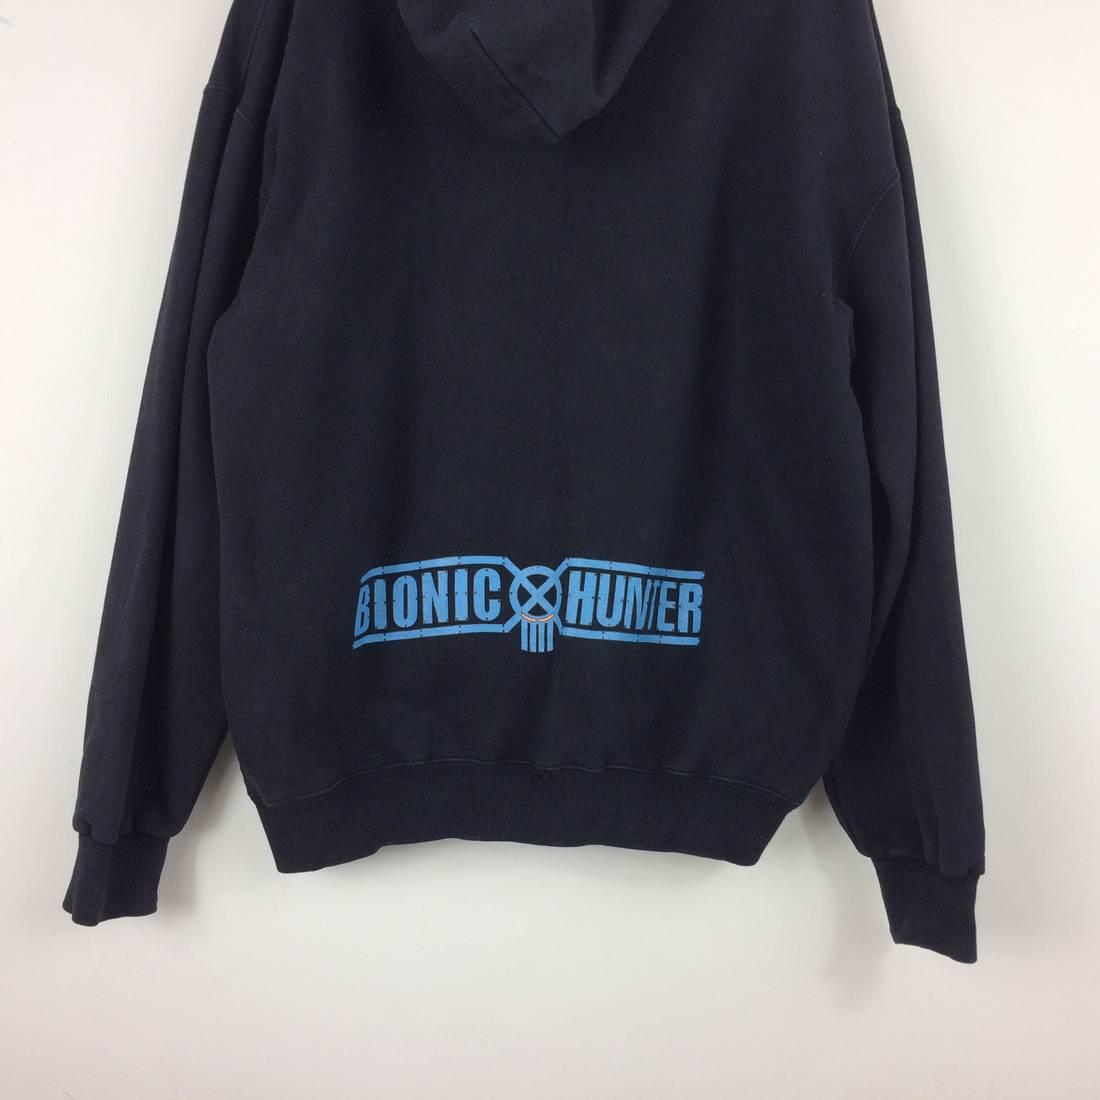 Rare!!! Bounty Hunter Pullover Sweatshirt